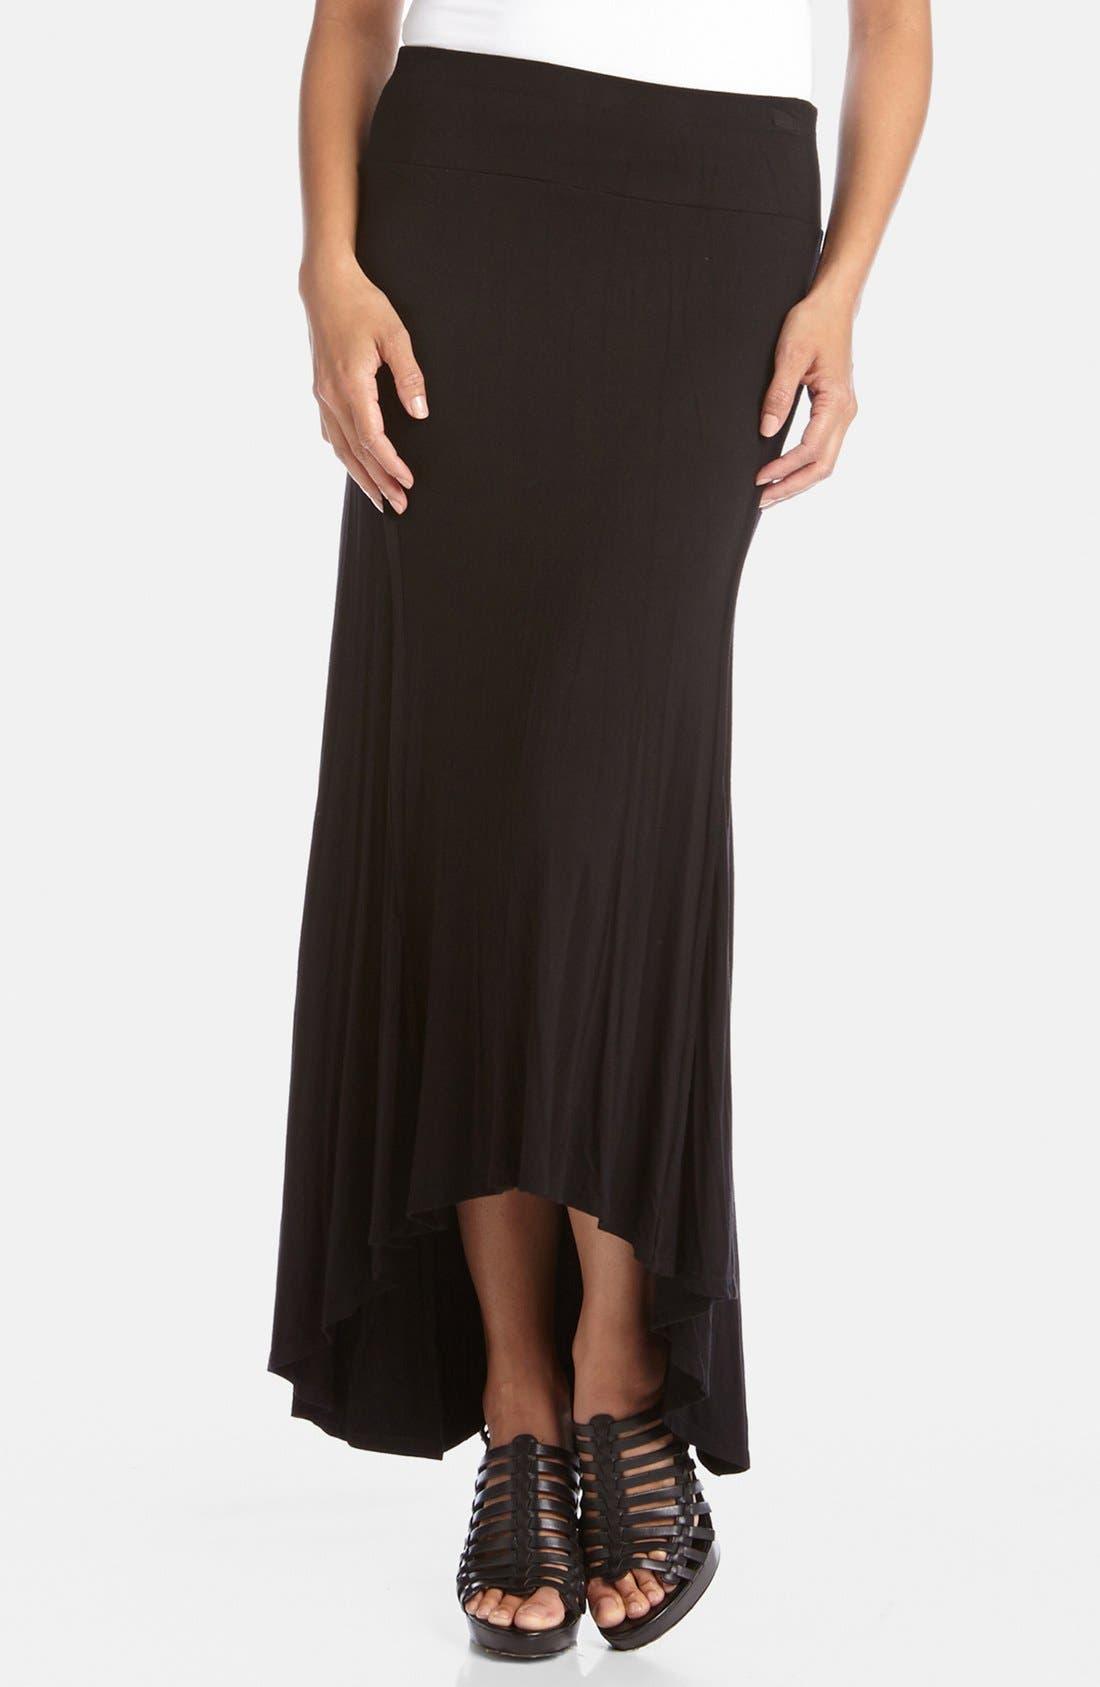 Alternate Image 1 Selected - Karen Kane Reverse Seam High/Low Skirt